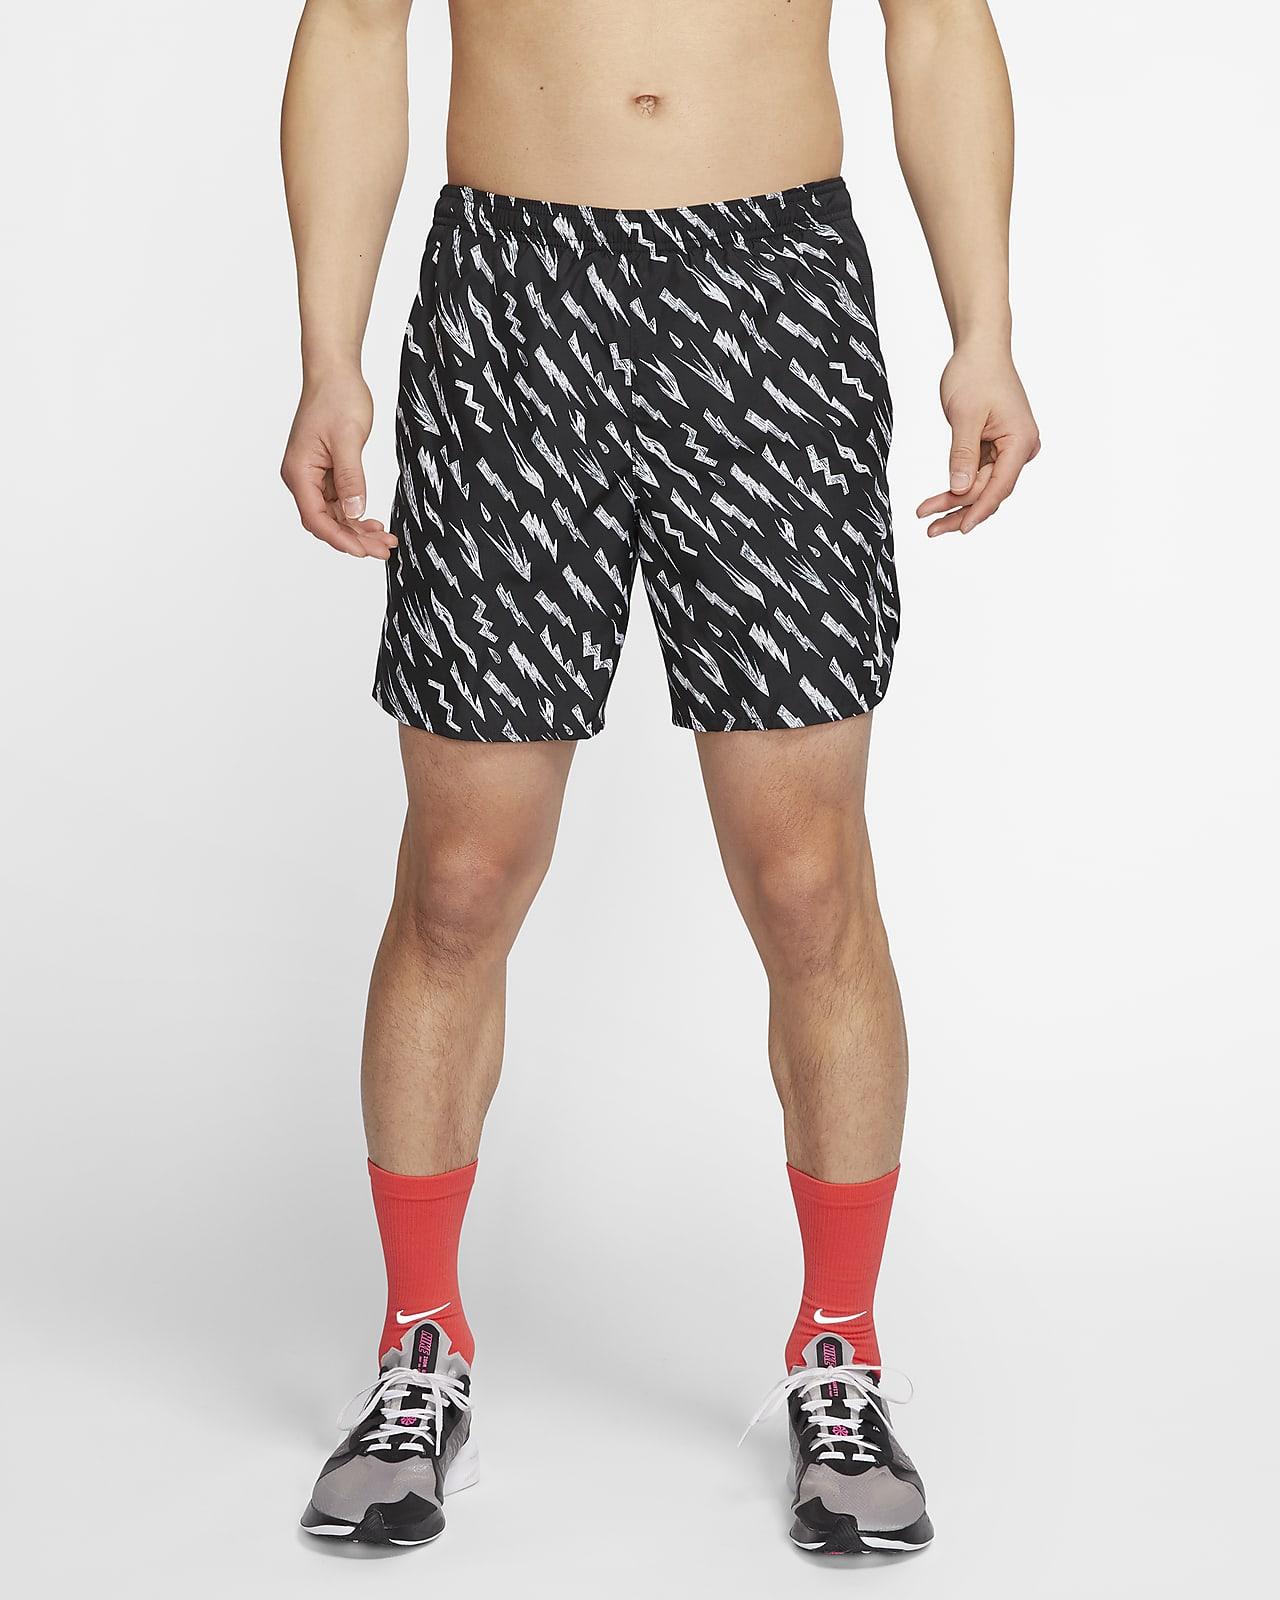 Nike Challenger Men's 18cm (approx.) Running Shorts